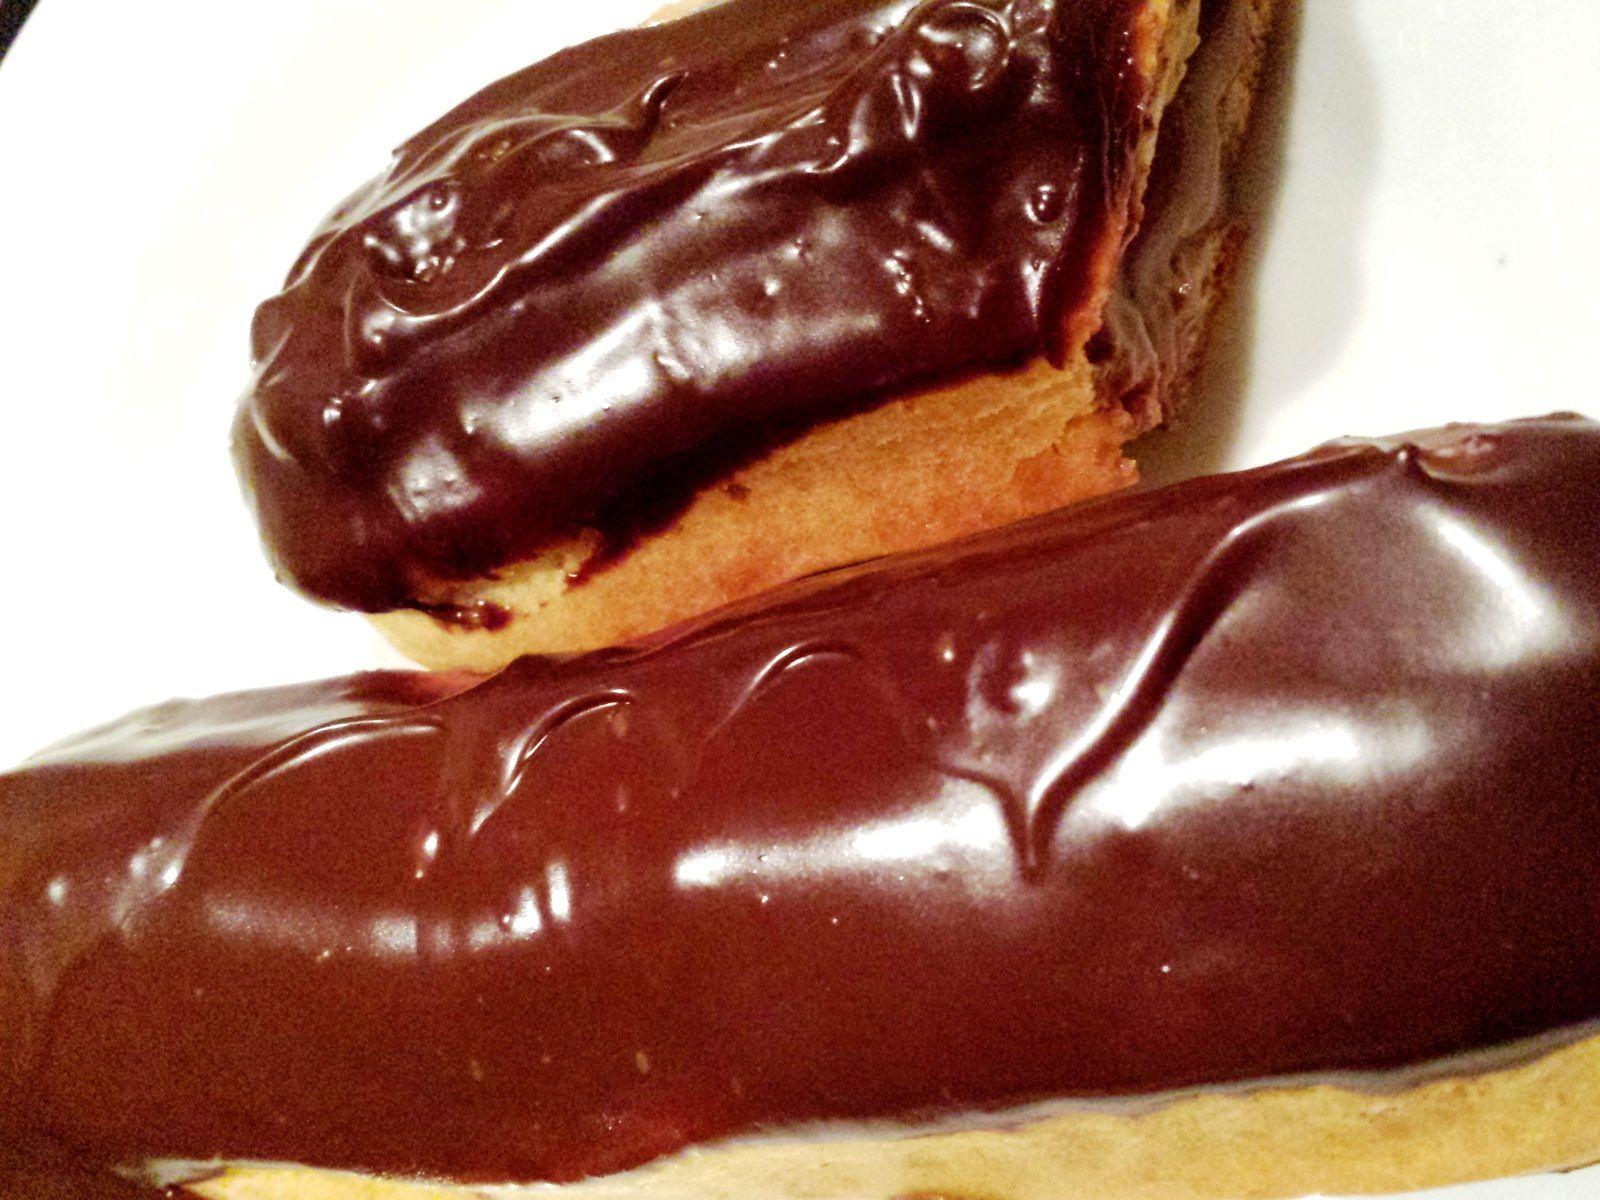 Eclairs au chocolat de l'Encyclopédie du chocolat Valrhona